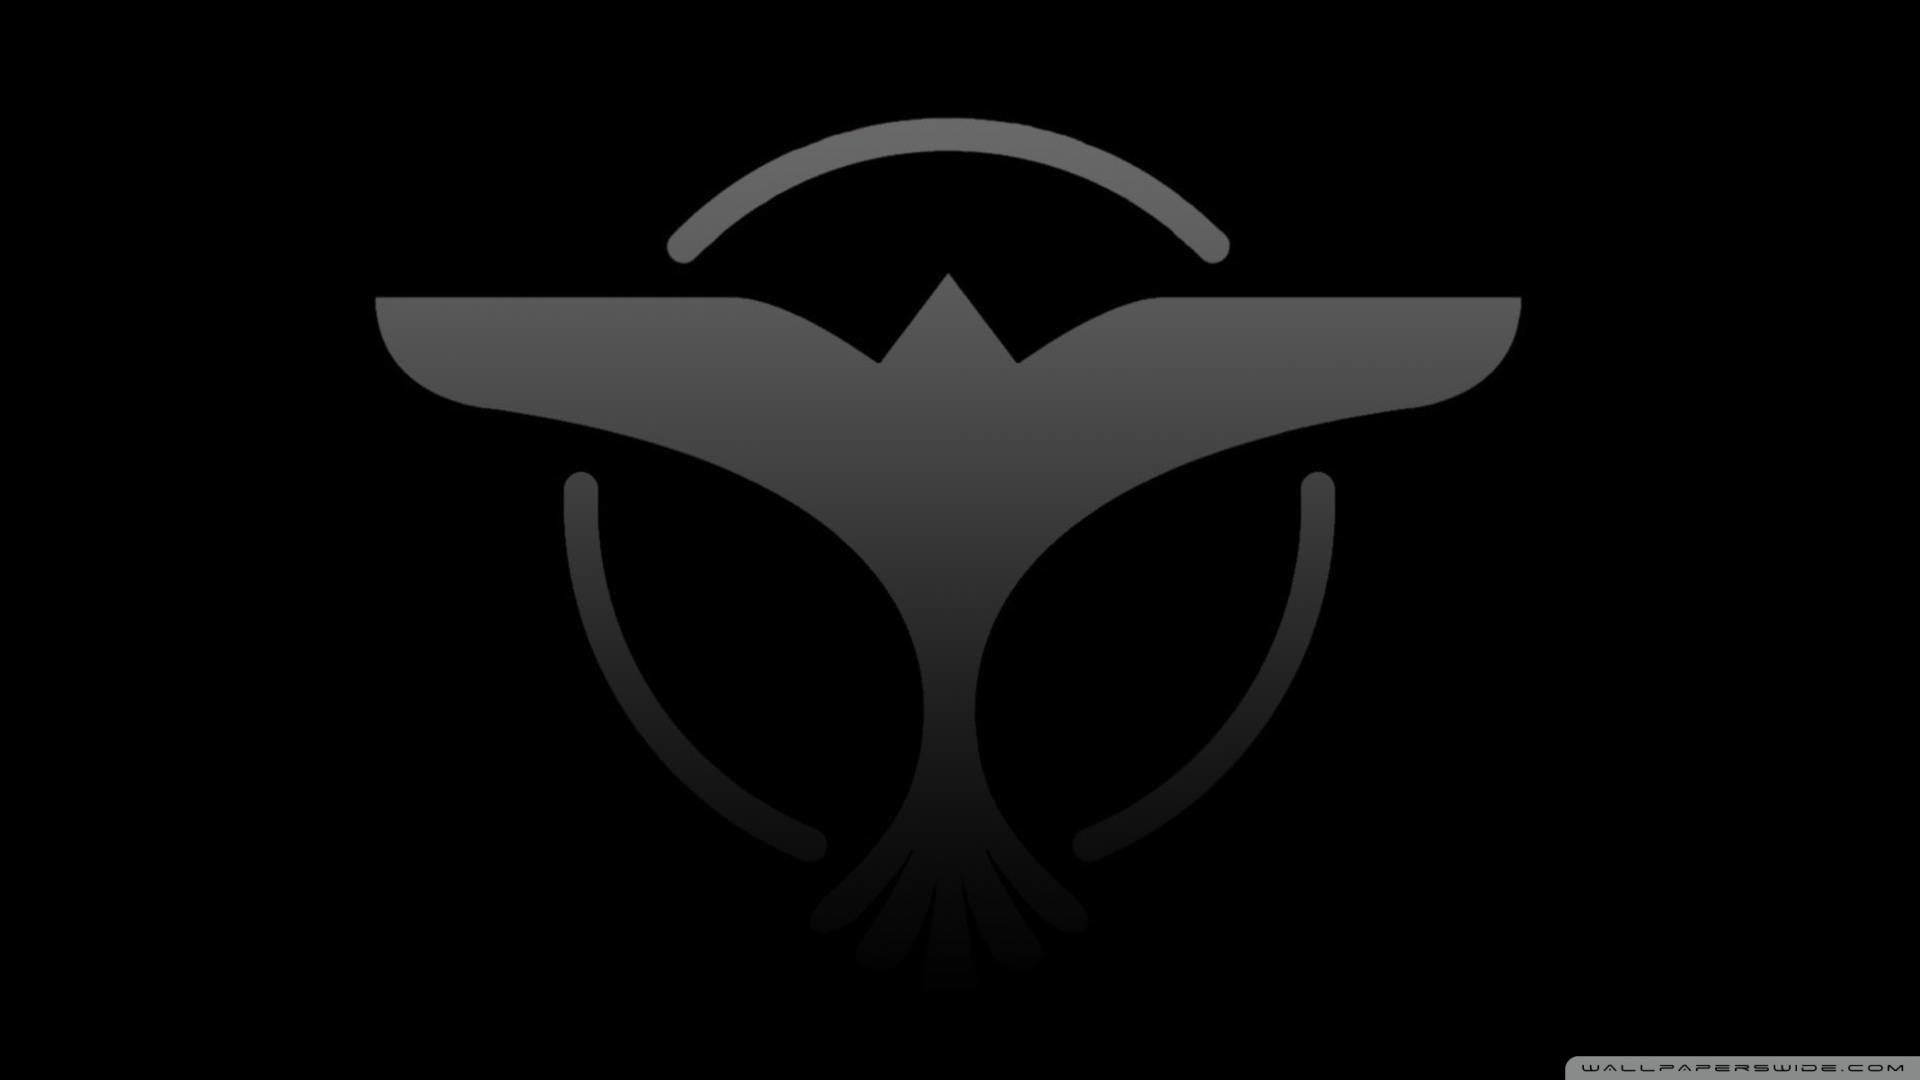 Dj Tiesto Wallpaper – Free Android Application – Createapk.com